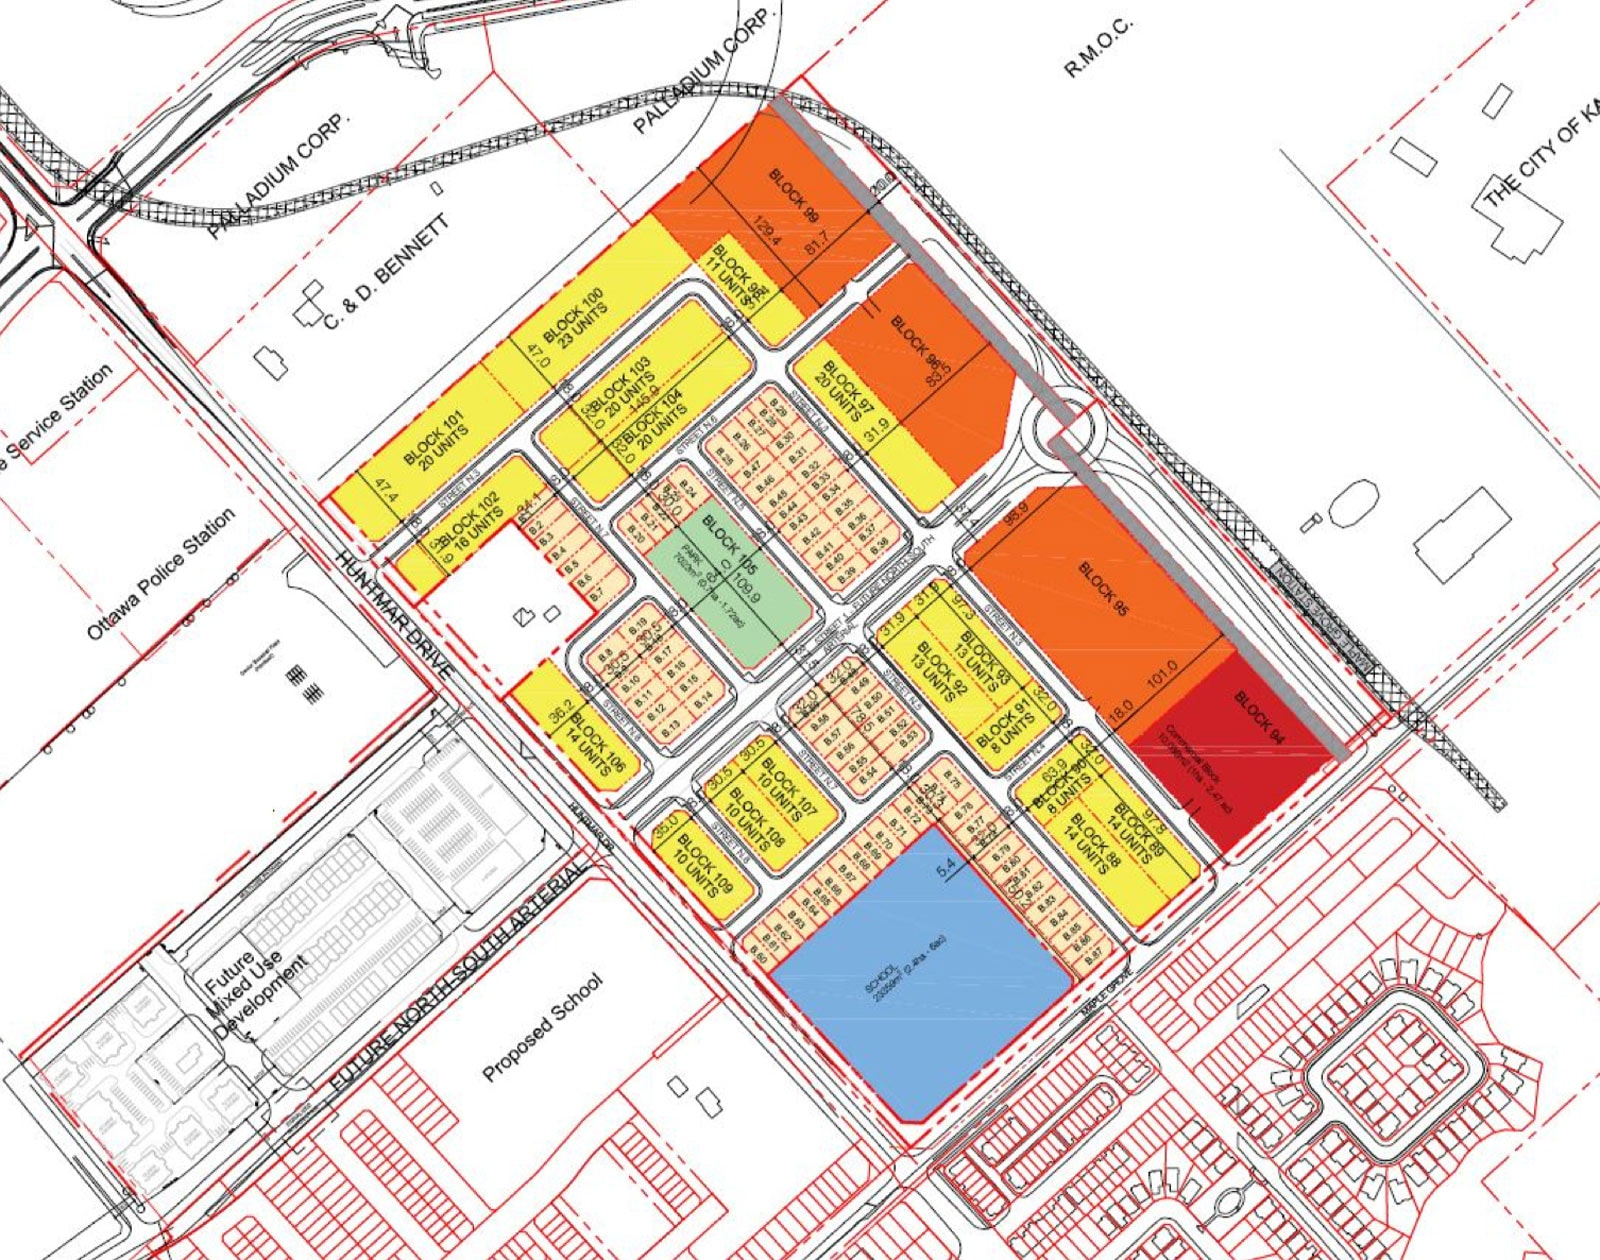 130 Huntmar Plan of Subdivision